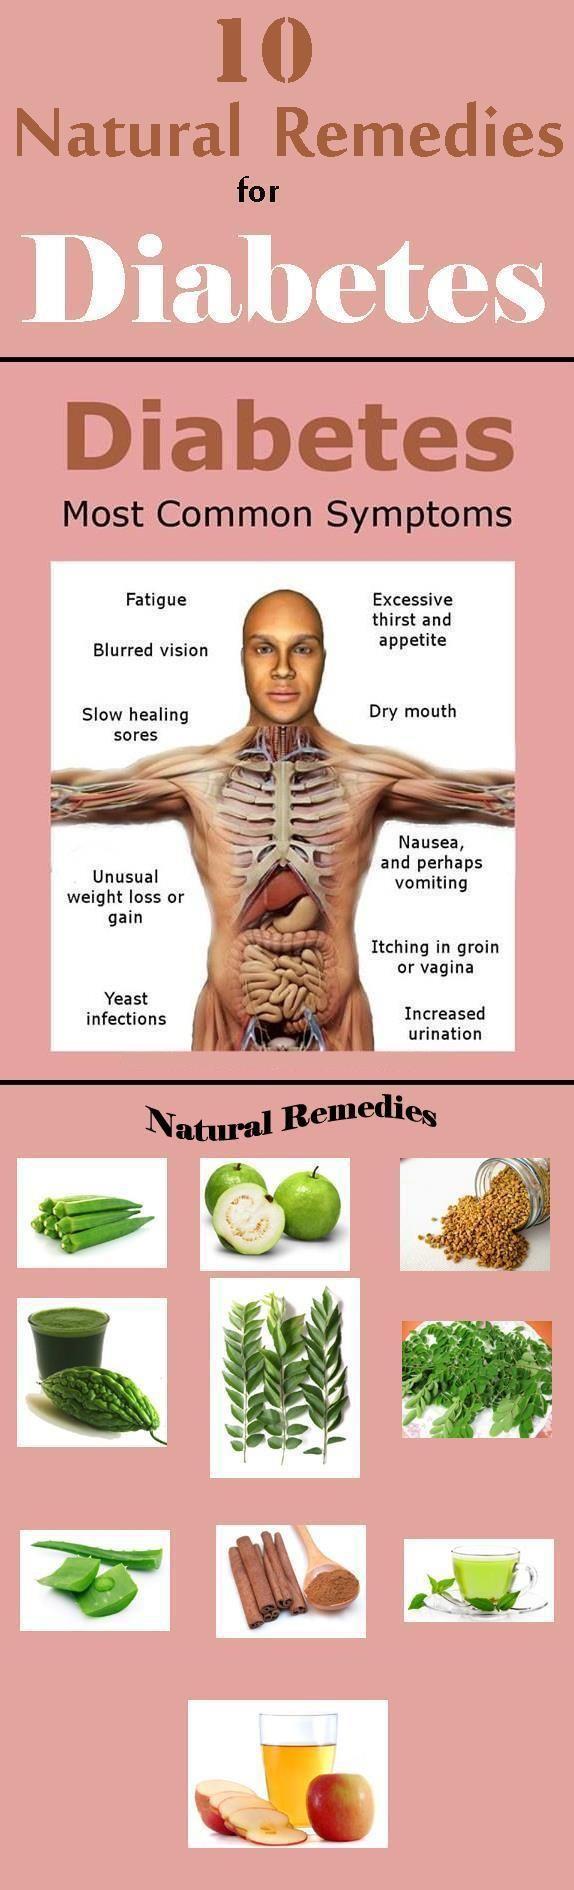 Top 10 Natural Remedies for Diabetes